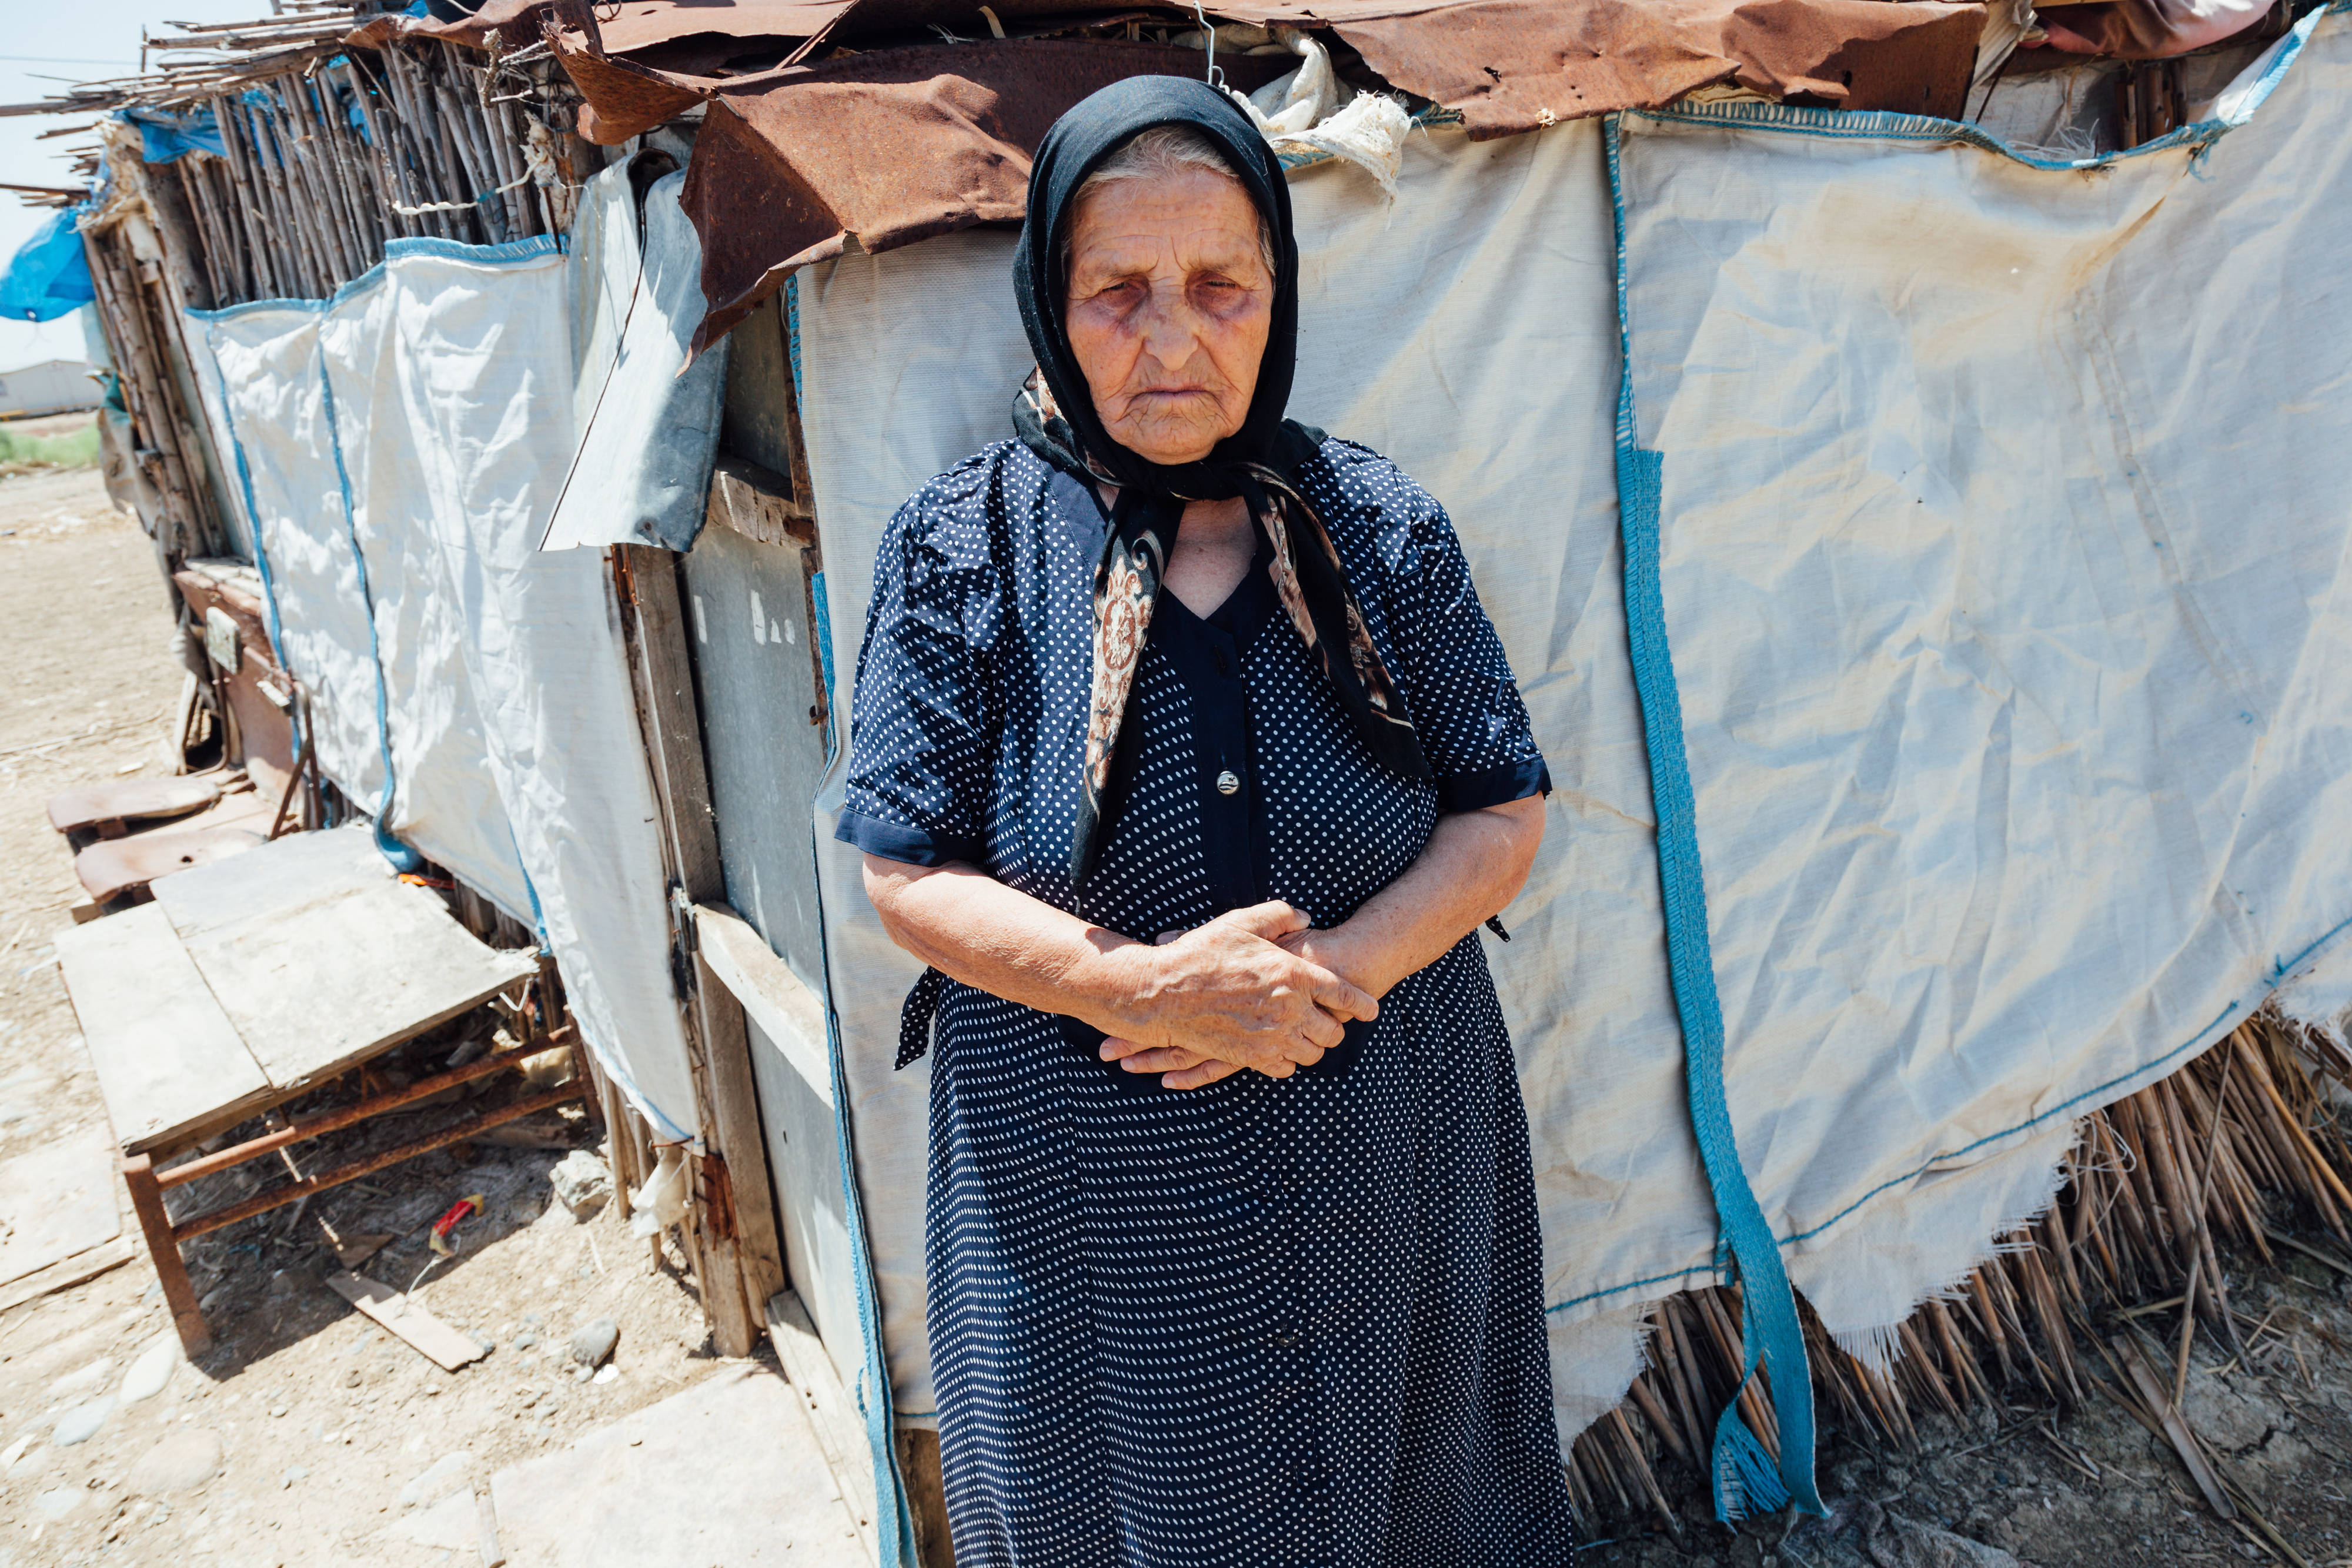 IMG_7033_Aserbaidschan_2010